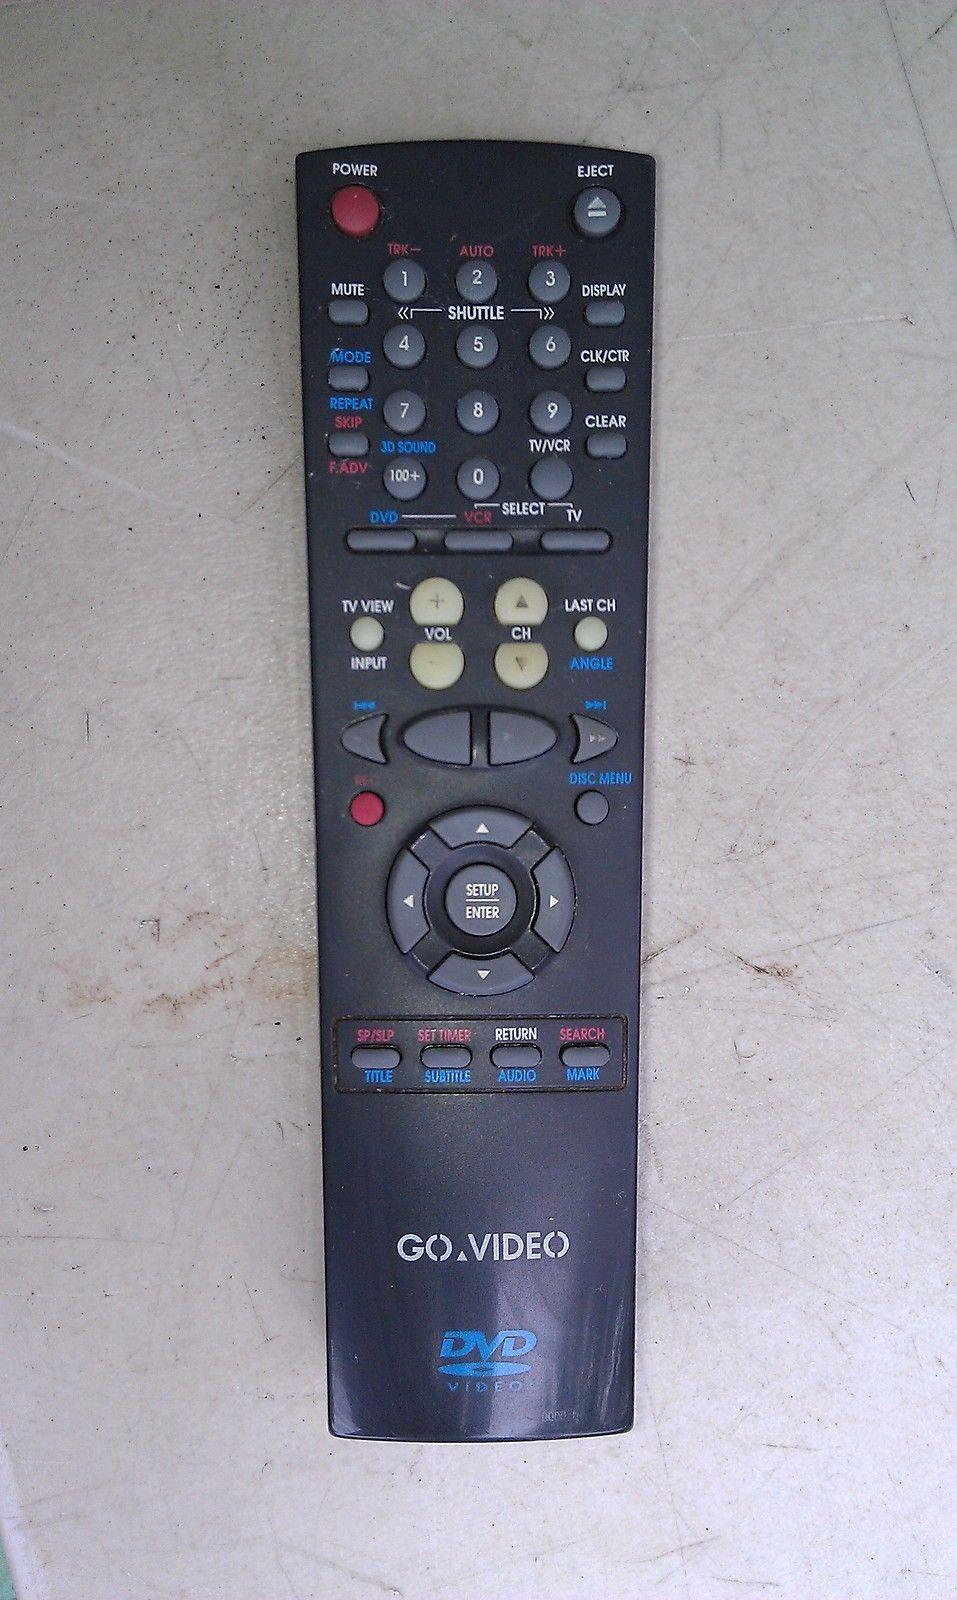 7JJJ42 GO VIDEO REMOTE CONTROL FOR DVD/VCR UNIT, VERY GOOD CONDITION - $10.66